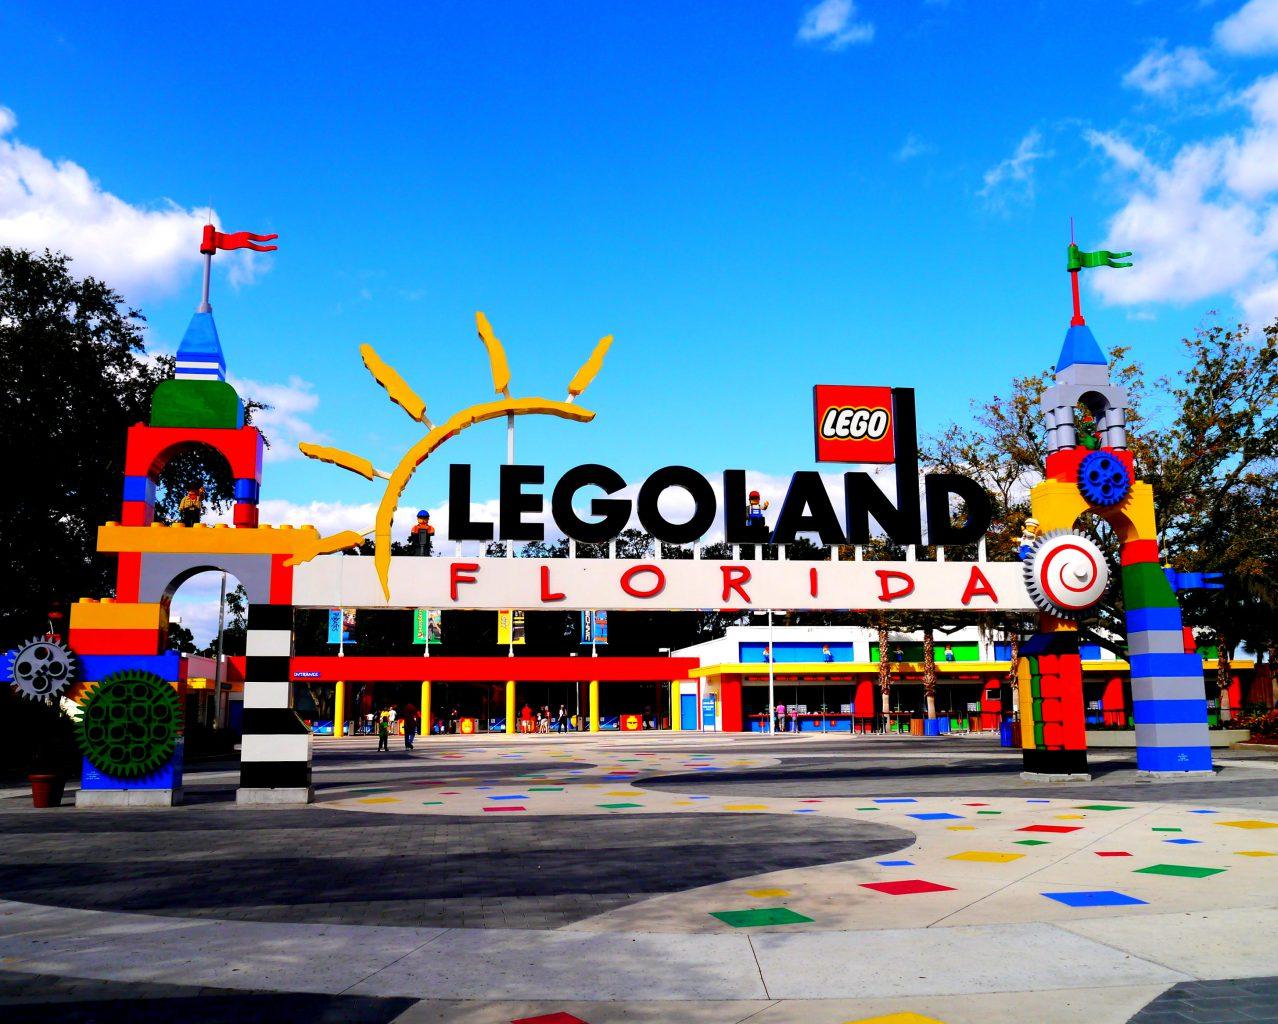 18 LEGOLAND Florida Tips Every Parent Should Know